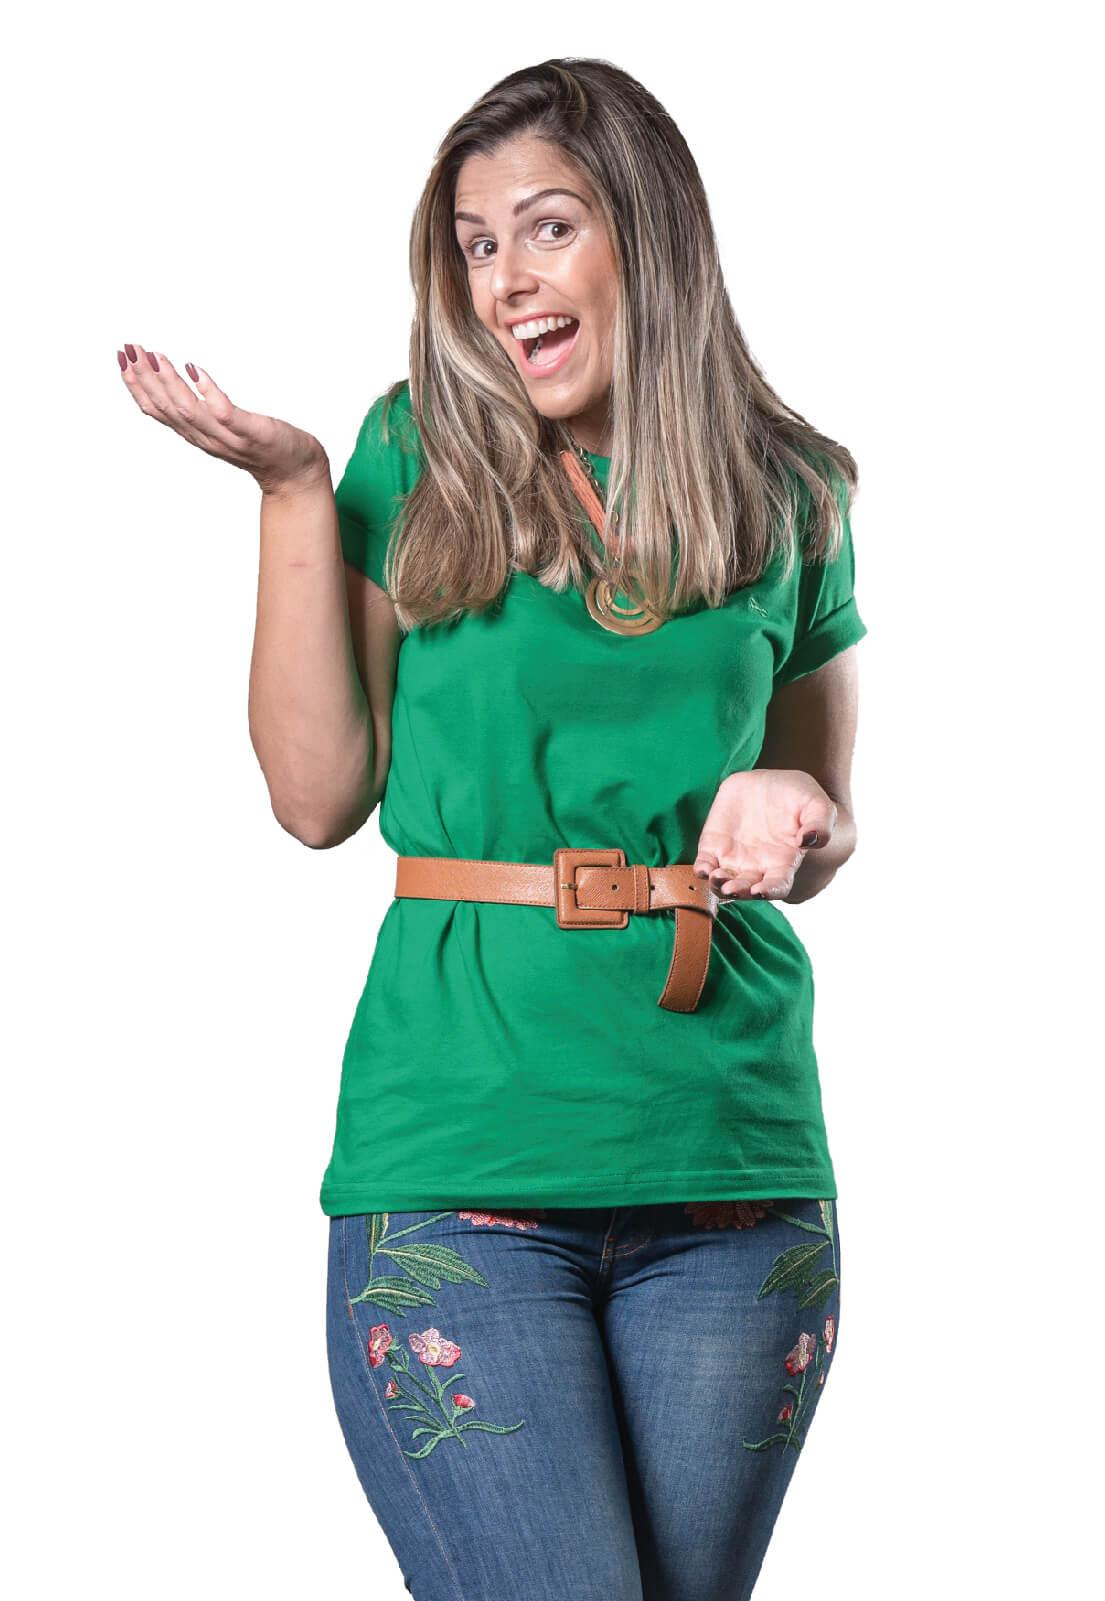 Camiseta Feminina 100% Algodão Super Premium, Na Cor Verde